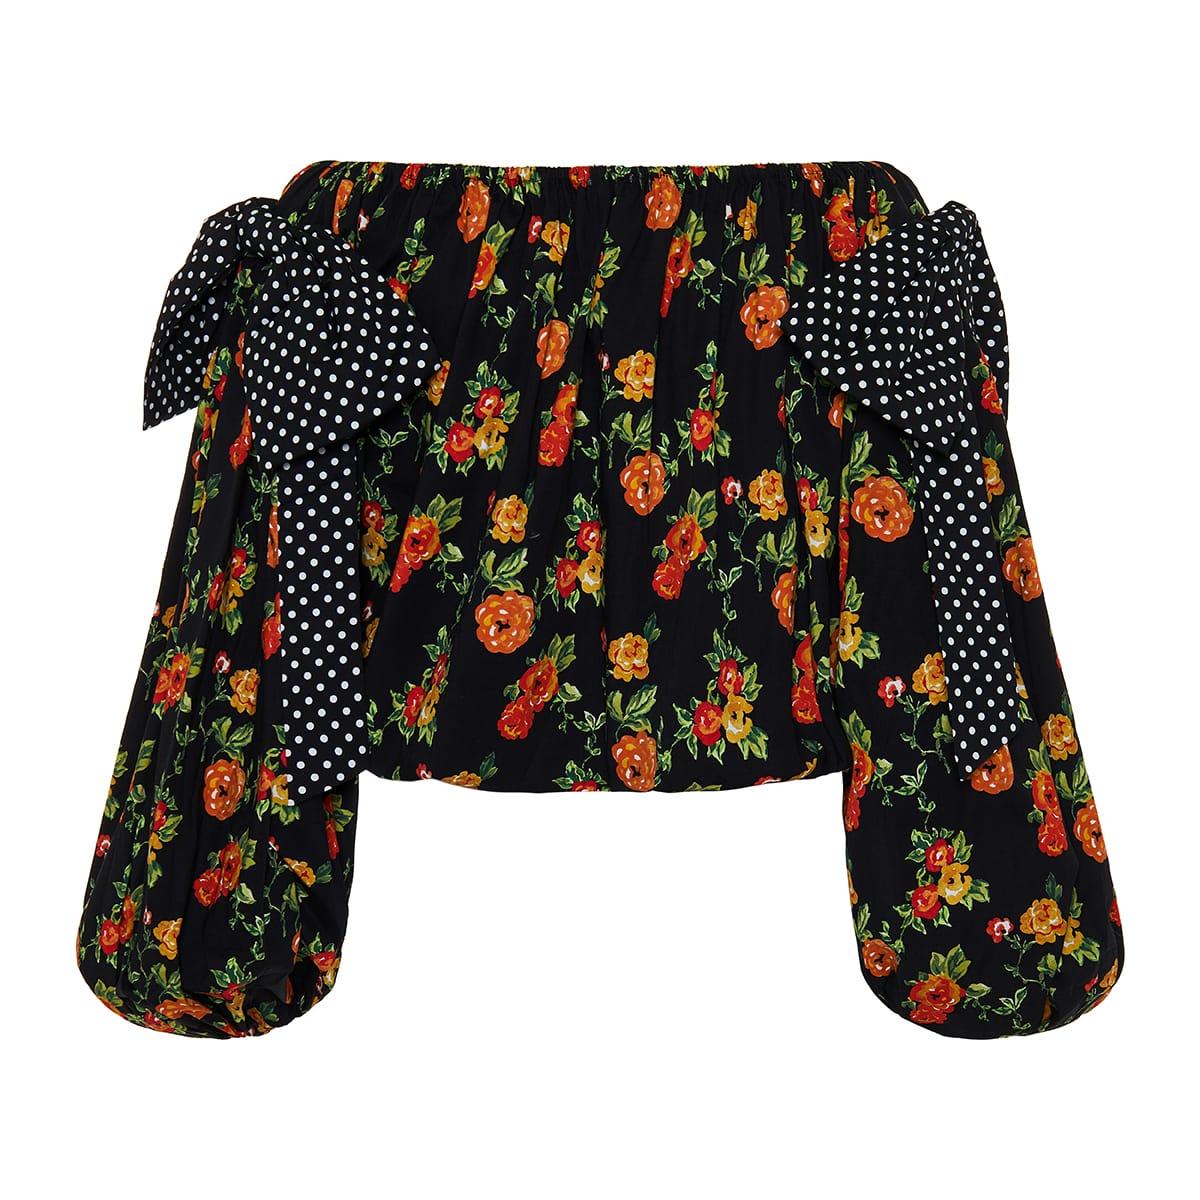 Mason off-the-shoulder floral top